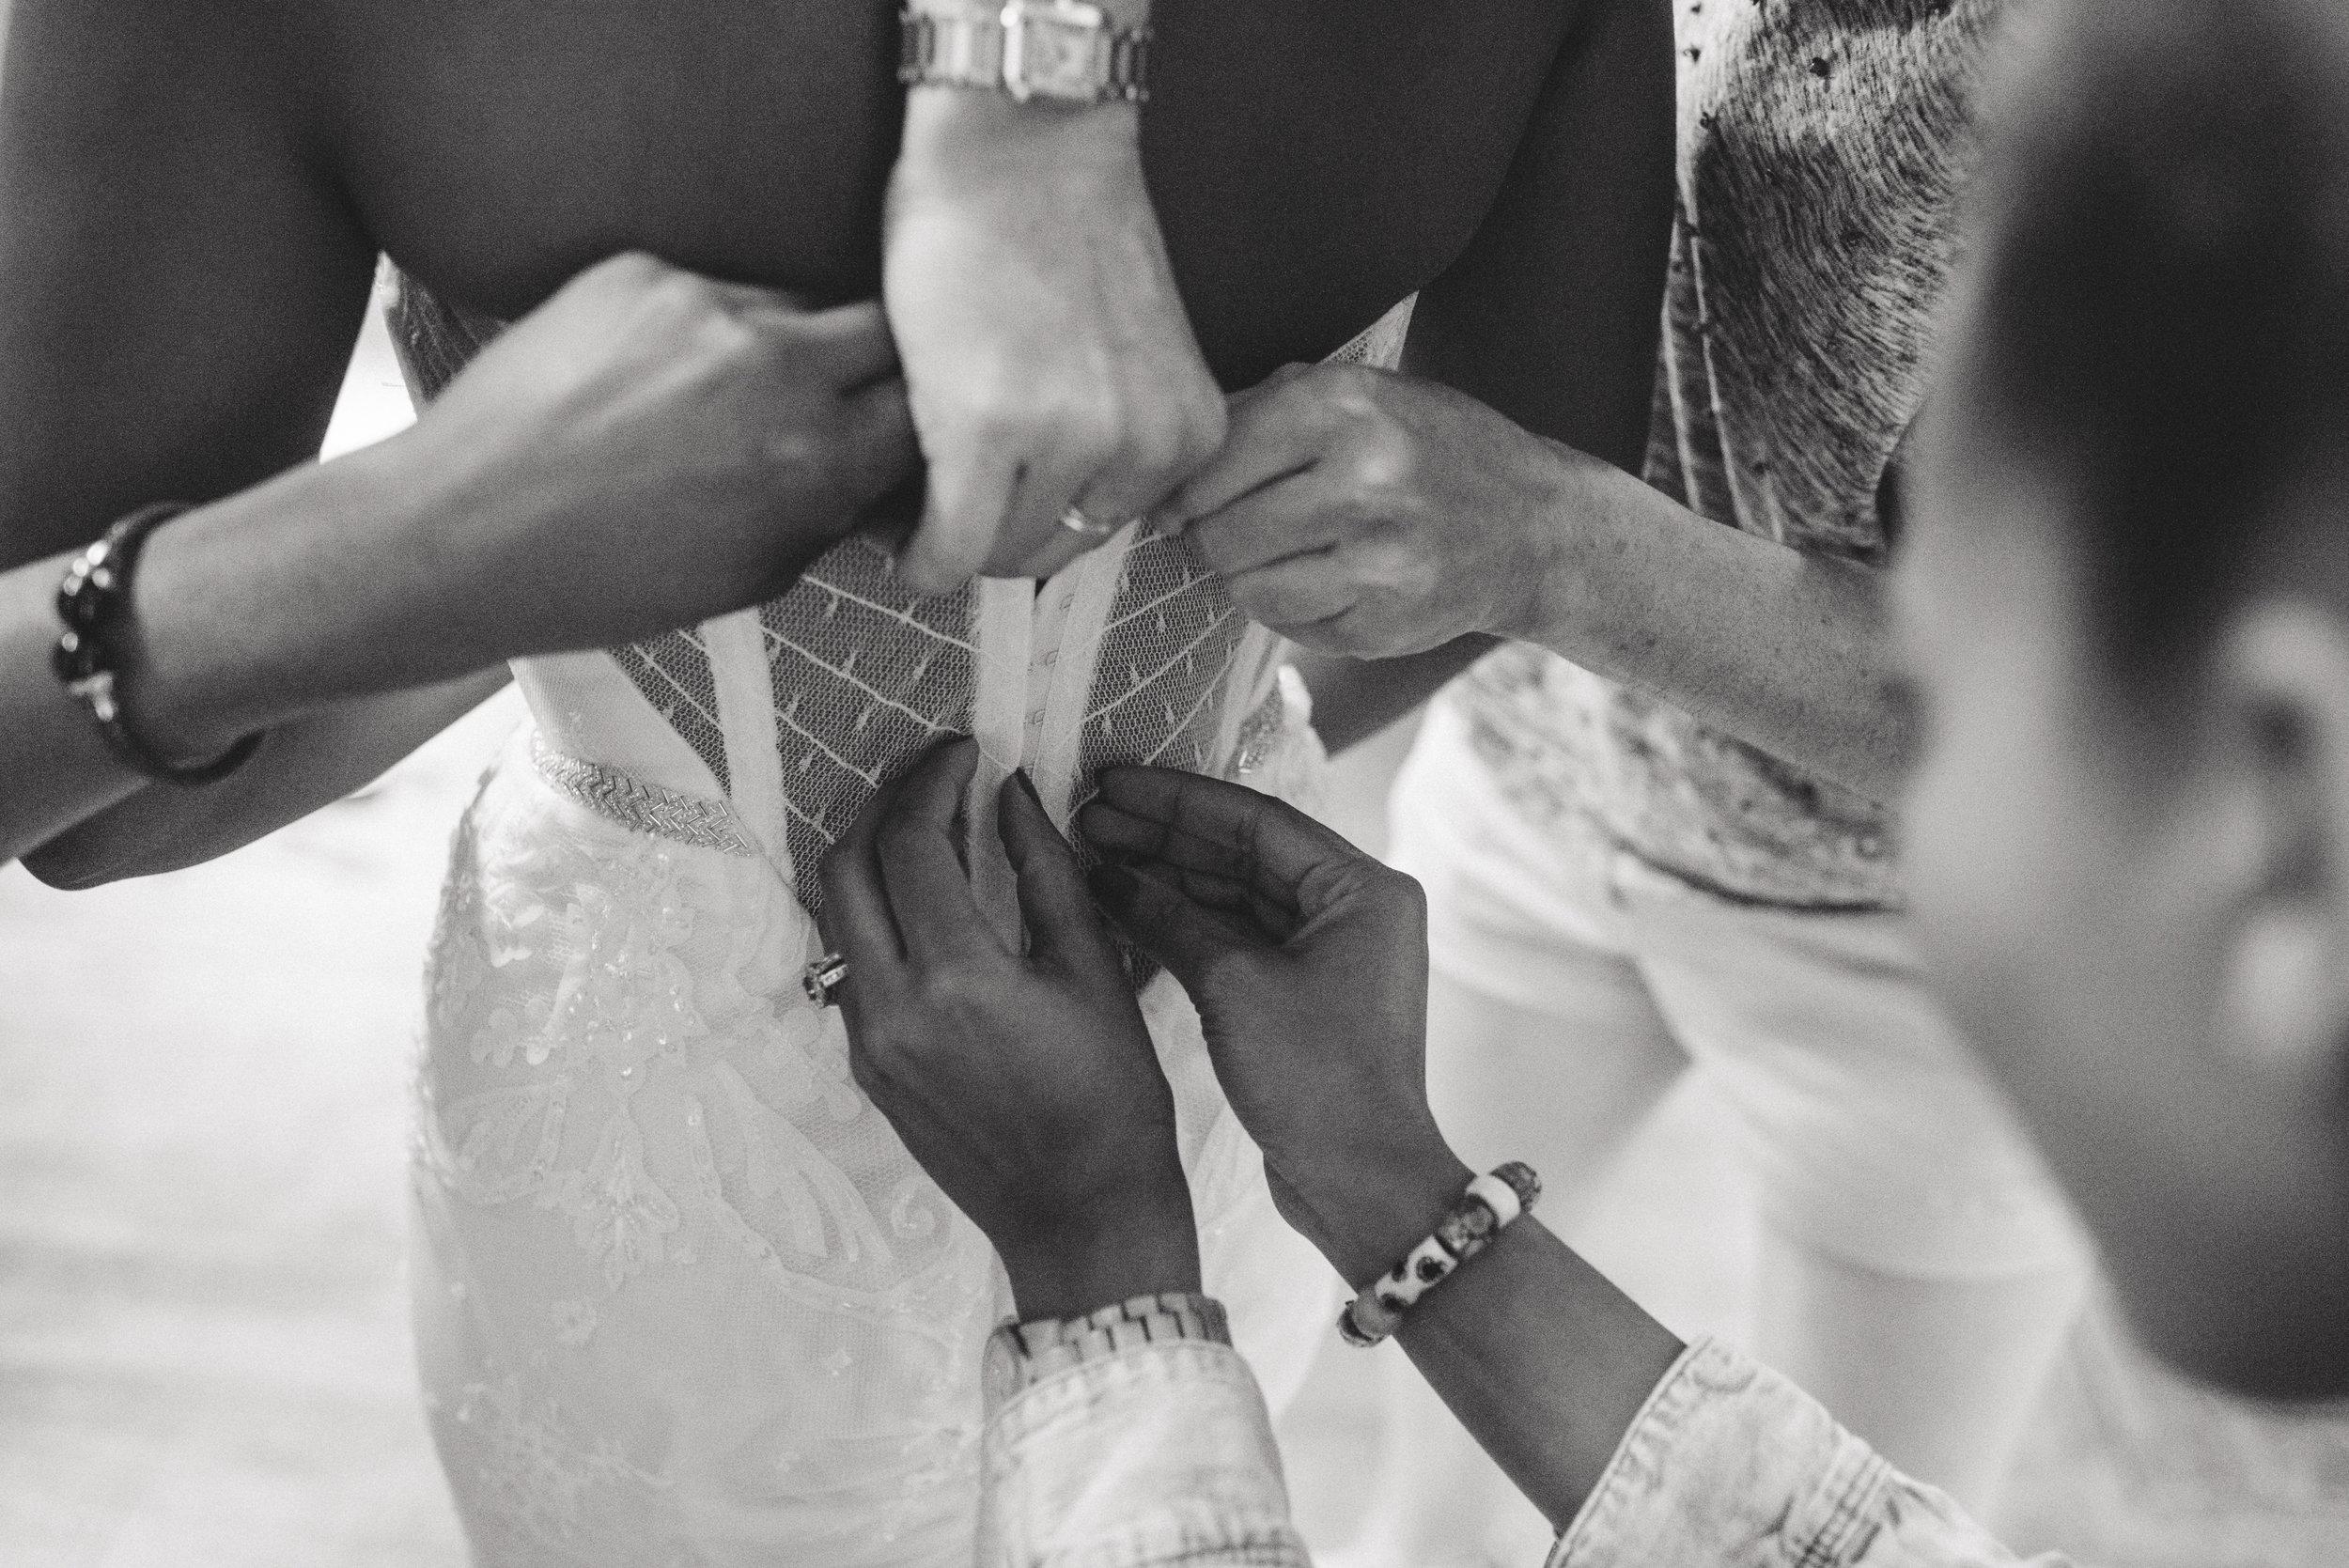 SADATU & KAREEM - GLENVIEW MANSION WEDDING - TWOTWENTY by CHI-CHI AGBIM-53.jpg